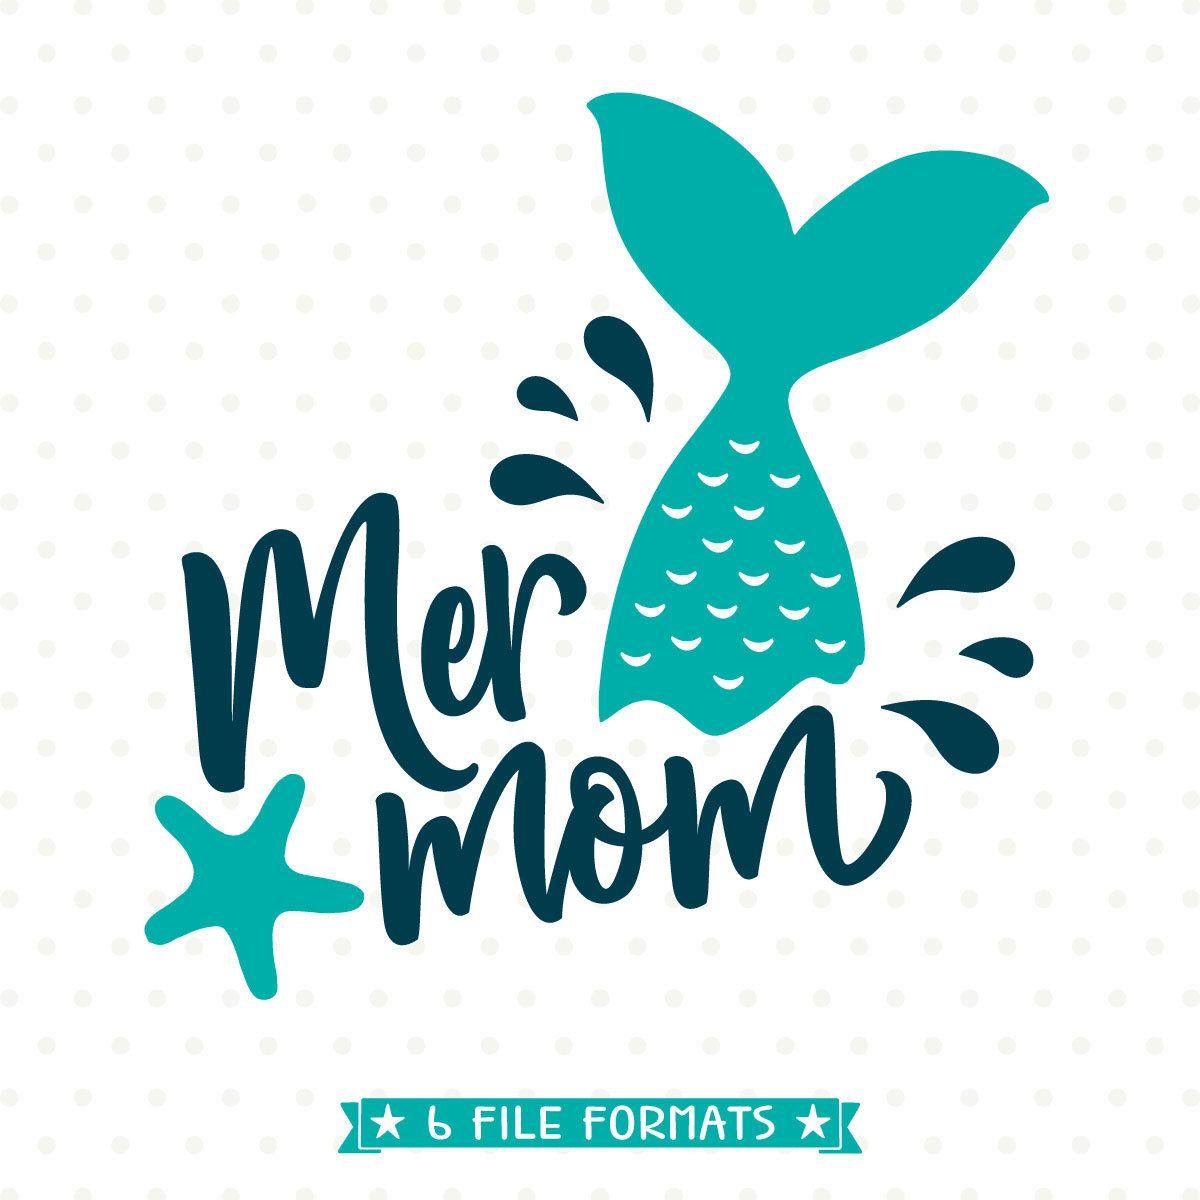 Mermaid Svg Mothers Day Svg Mermom Shirt Svg File Mom Shirt Etsy Mermaid Svg Mermom Baby Mermaid